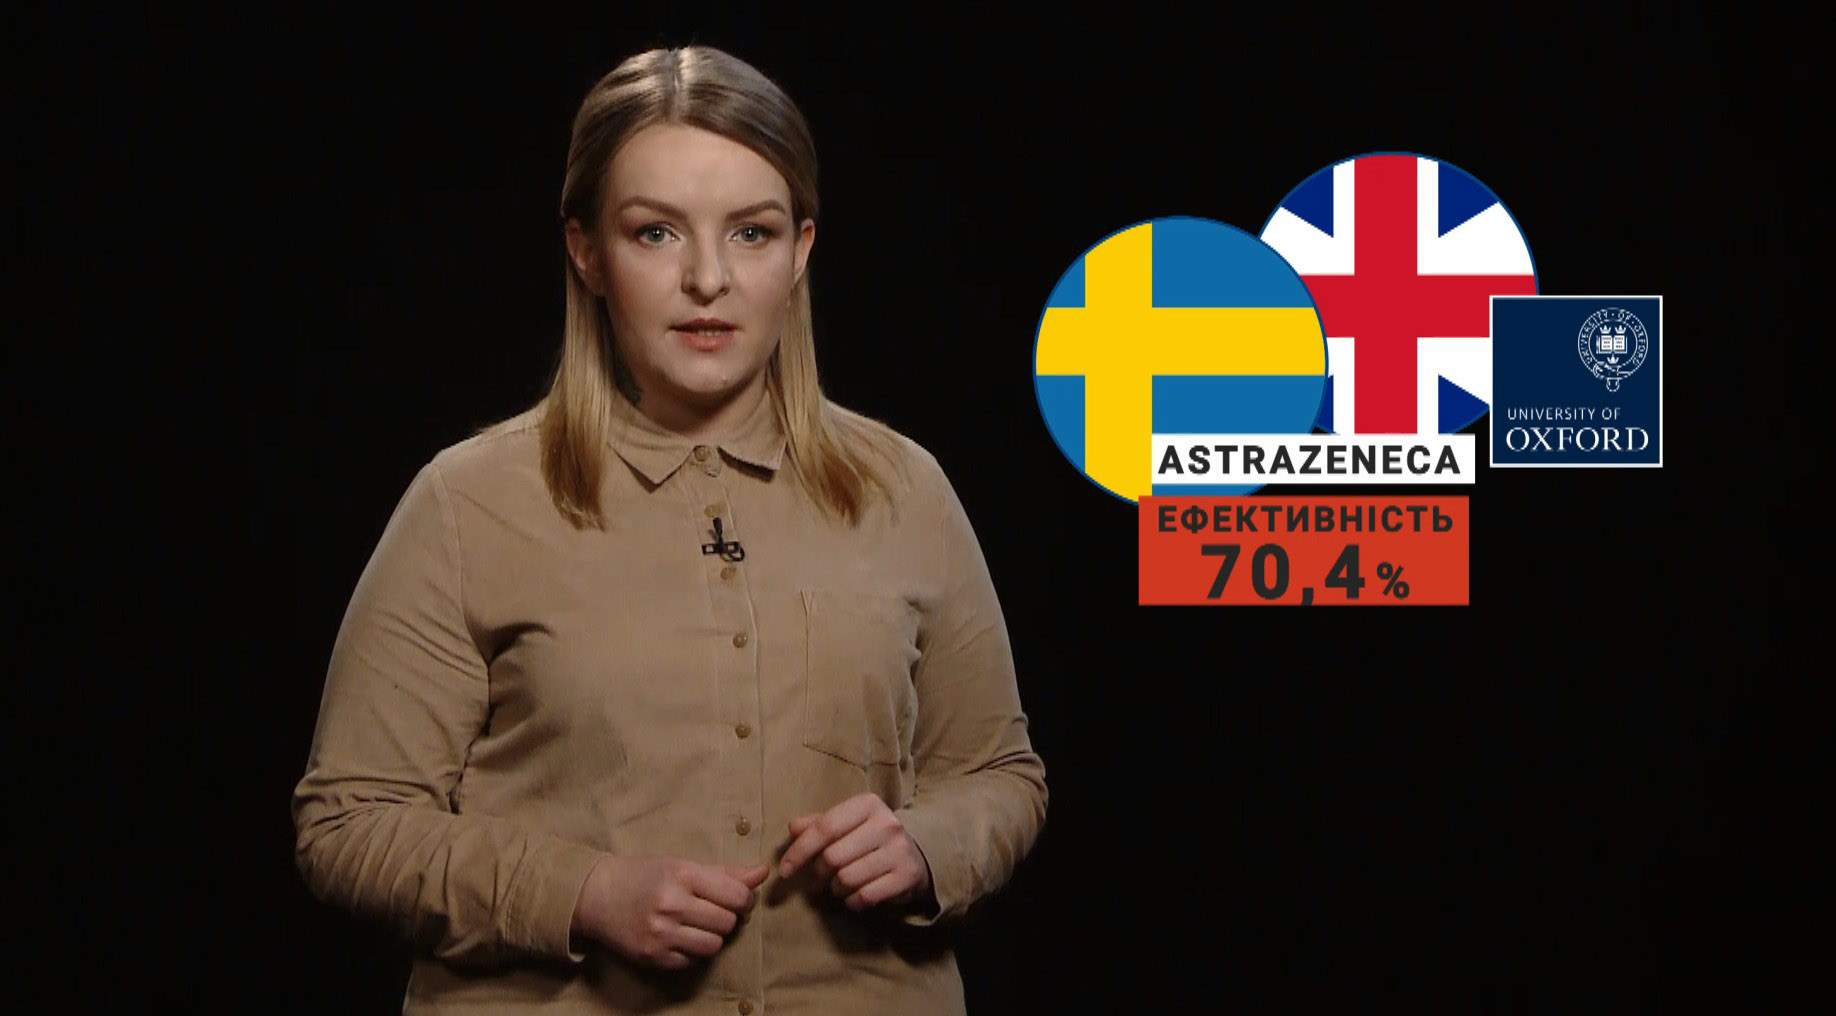 Астразенека